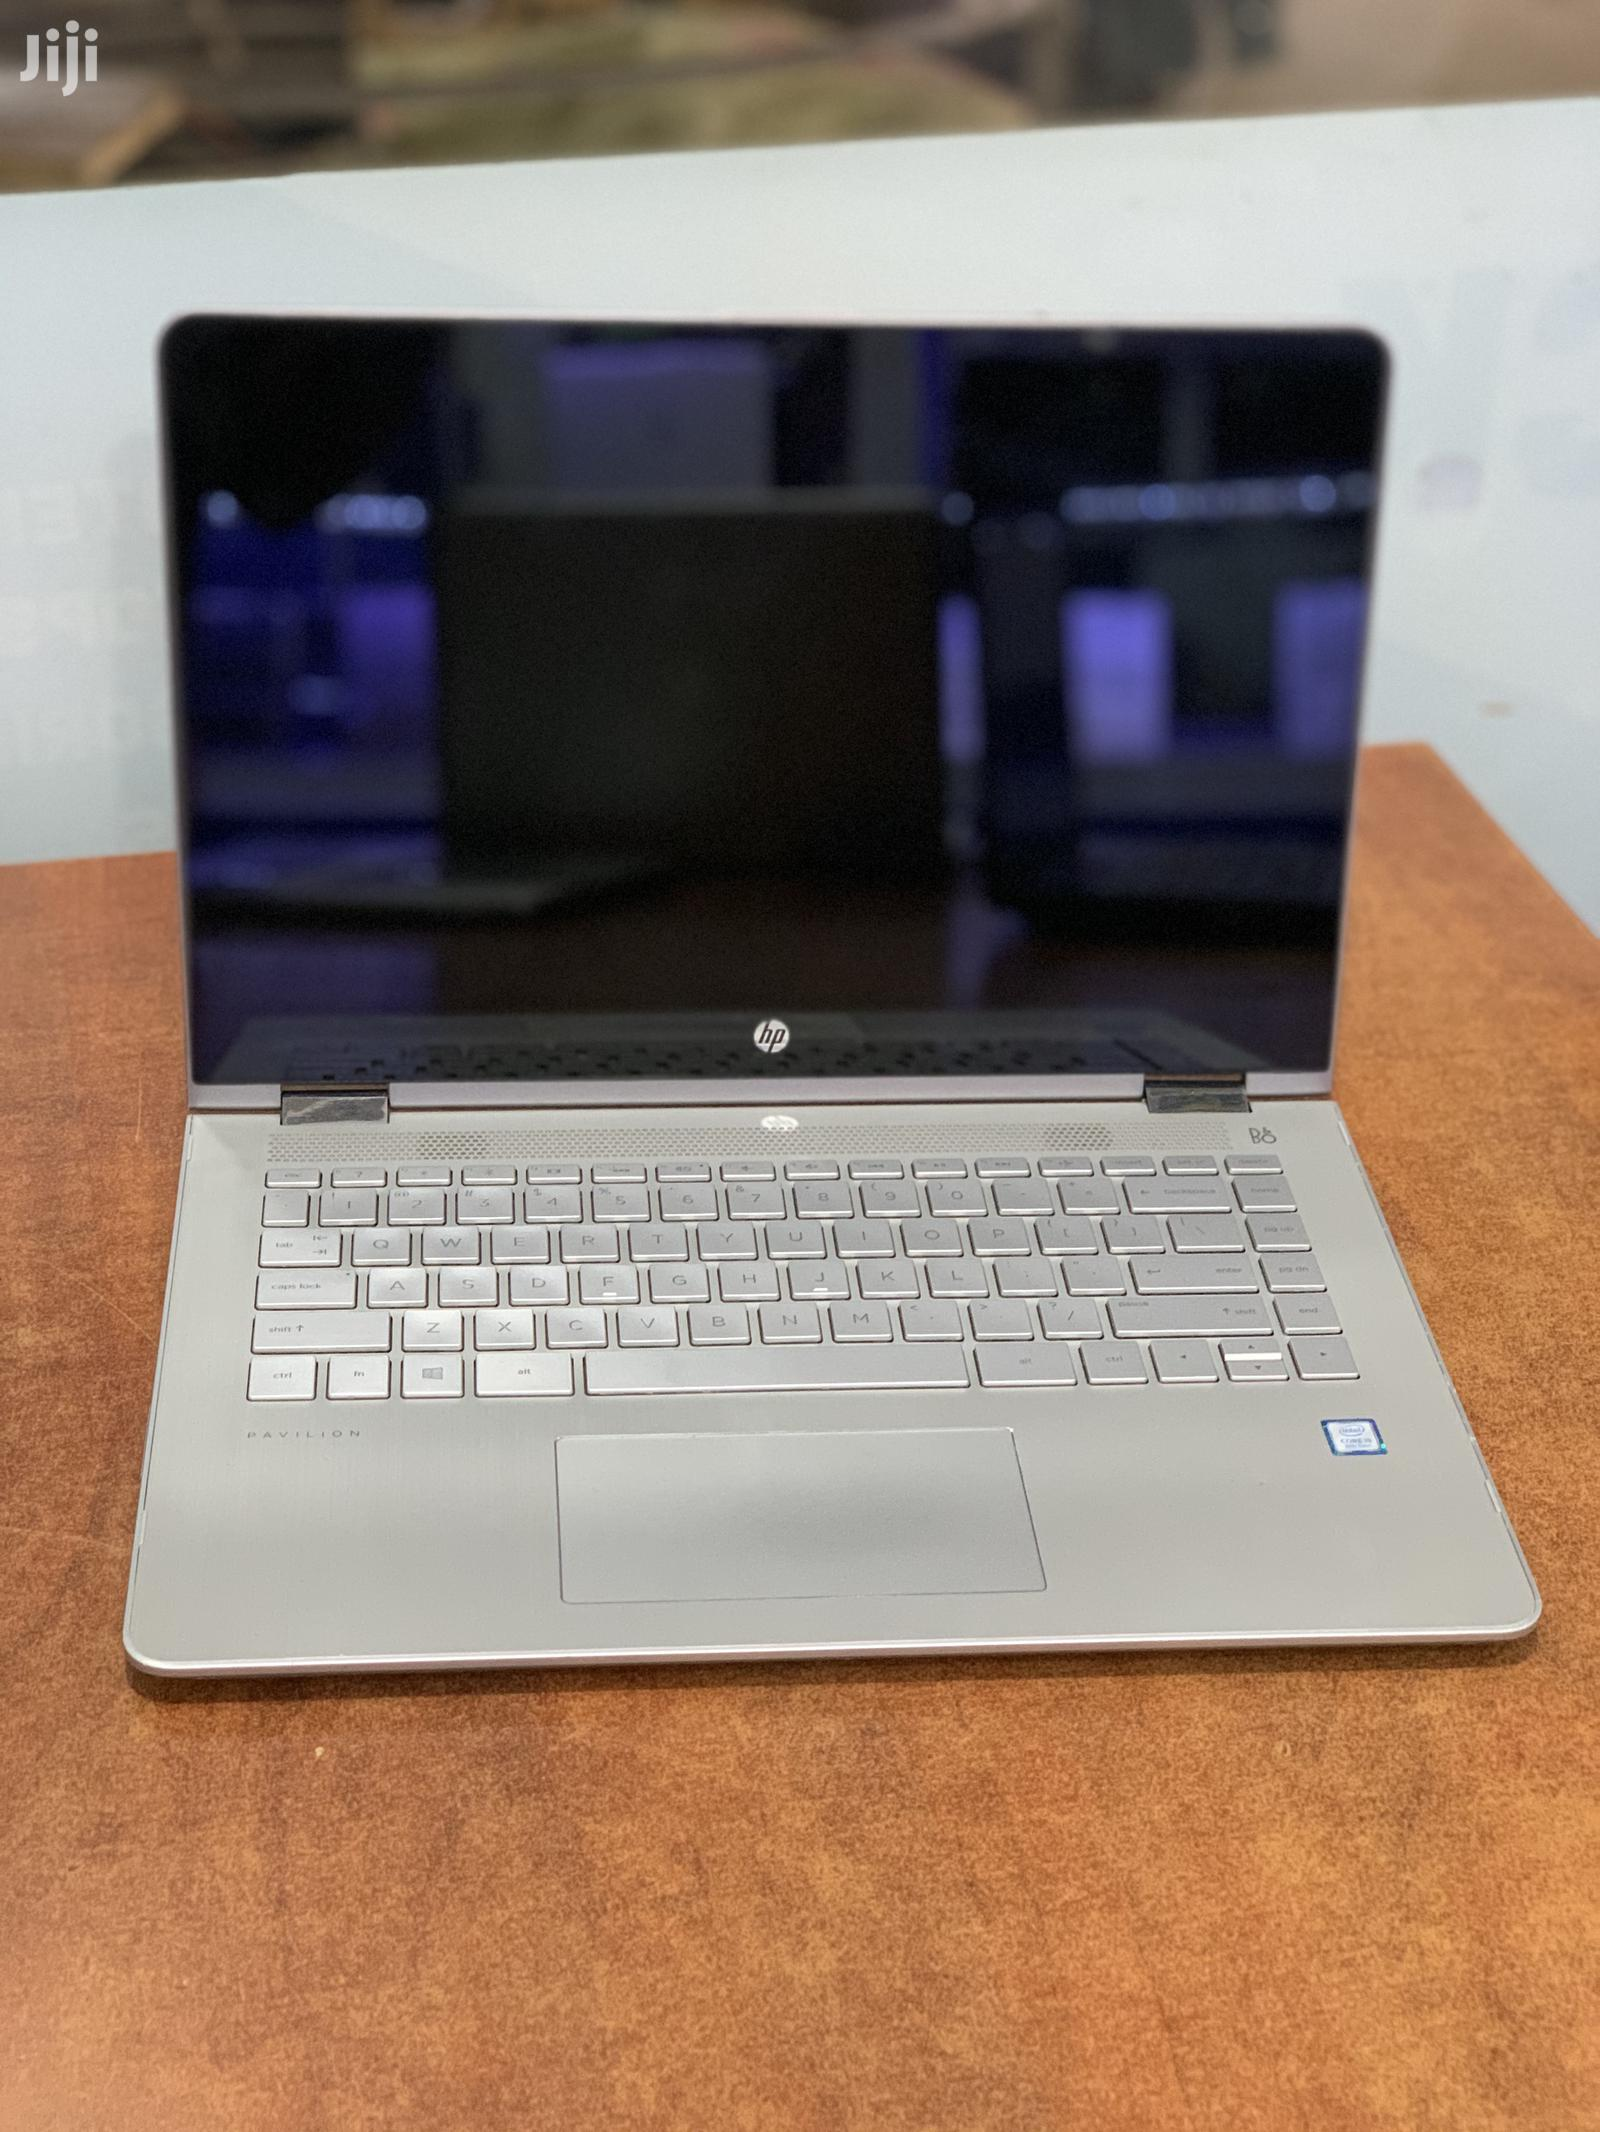 Laptop HP Pavilion X360 8GB Intel Core I5 SSHD (Hybrid) 1T | Laptops & Computers for sale in Kampala, Central Region, Uganda